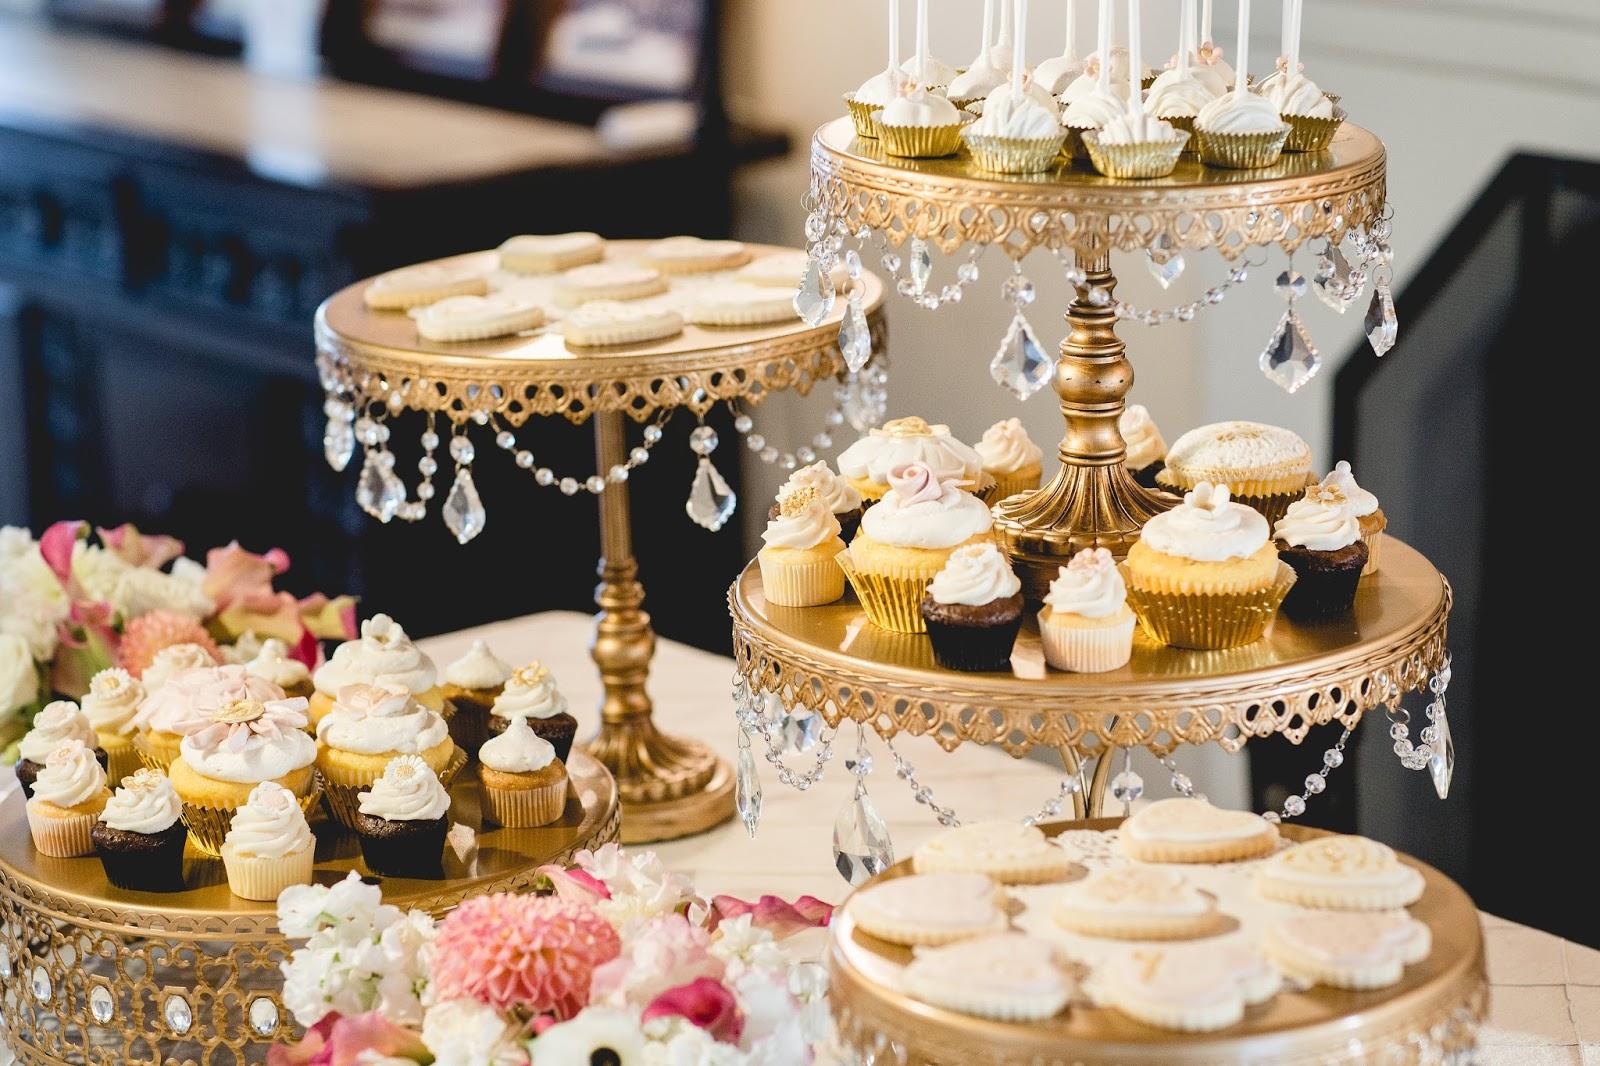 Plumeria Cake Studio Casa Romantica Styled Photo Shoot